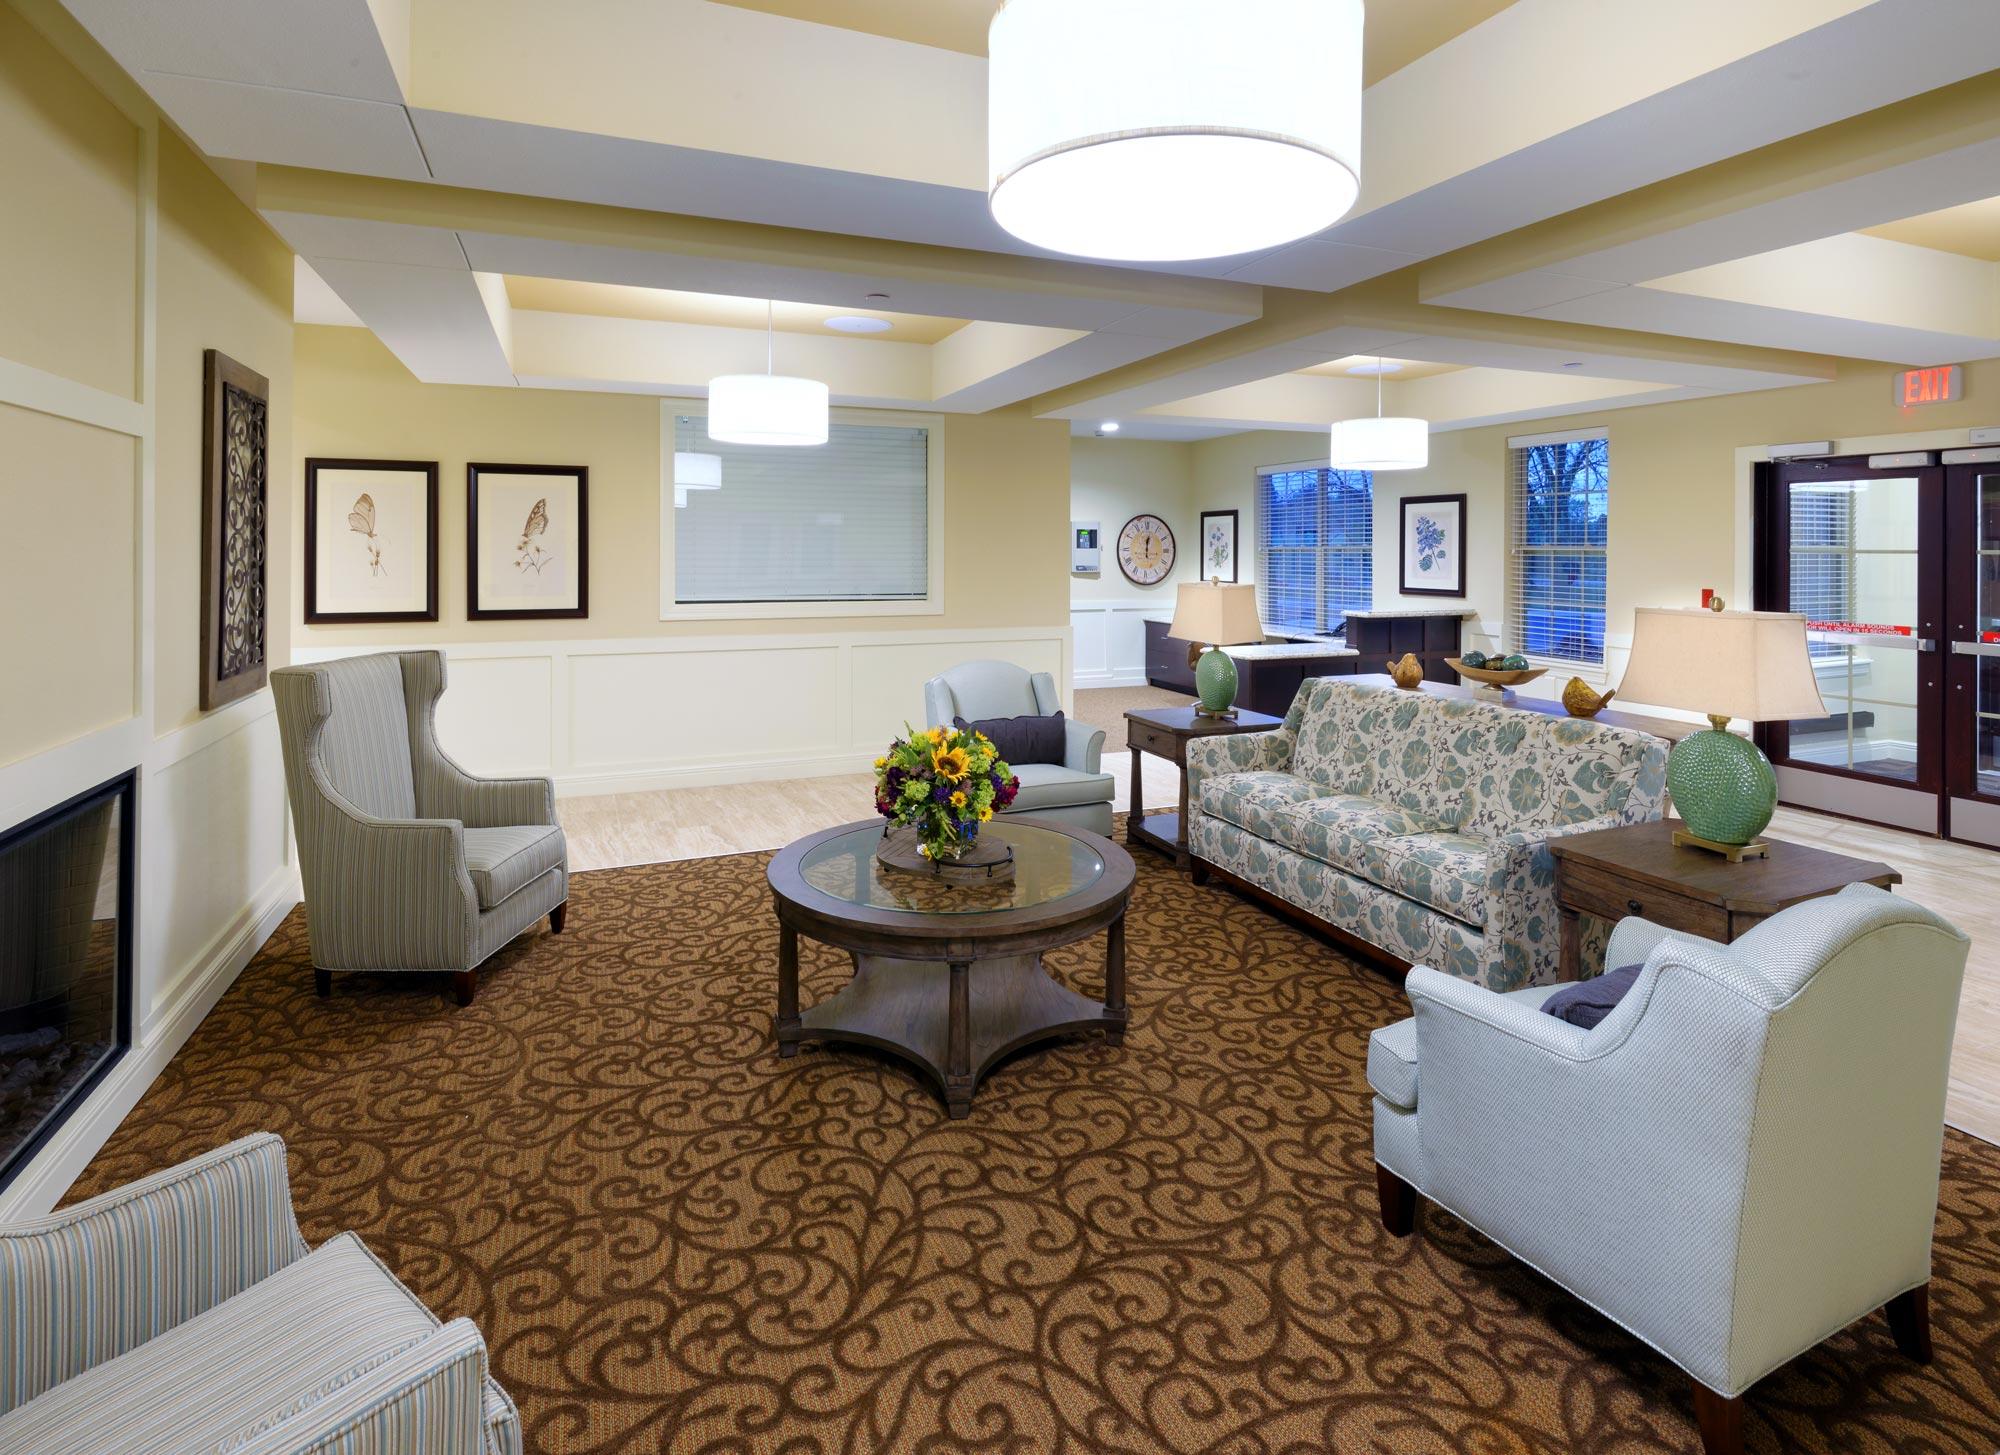 Castlewood-Senior-Living-H-Design-Interior-05.jpg